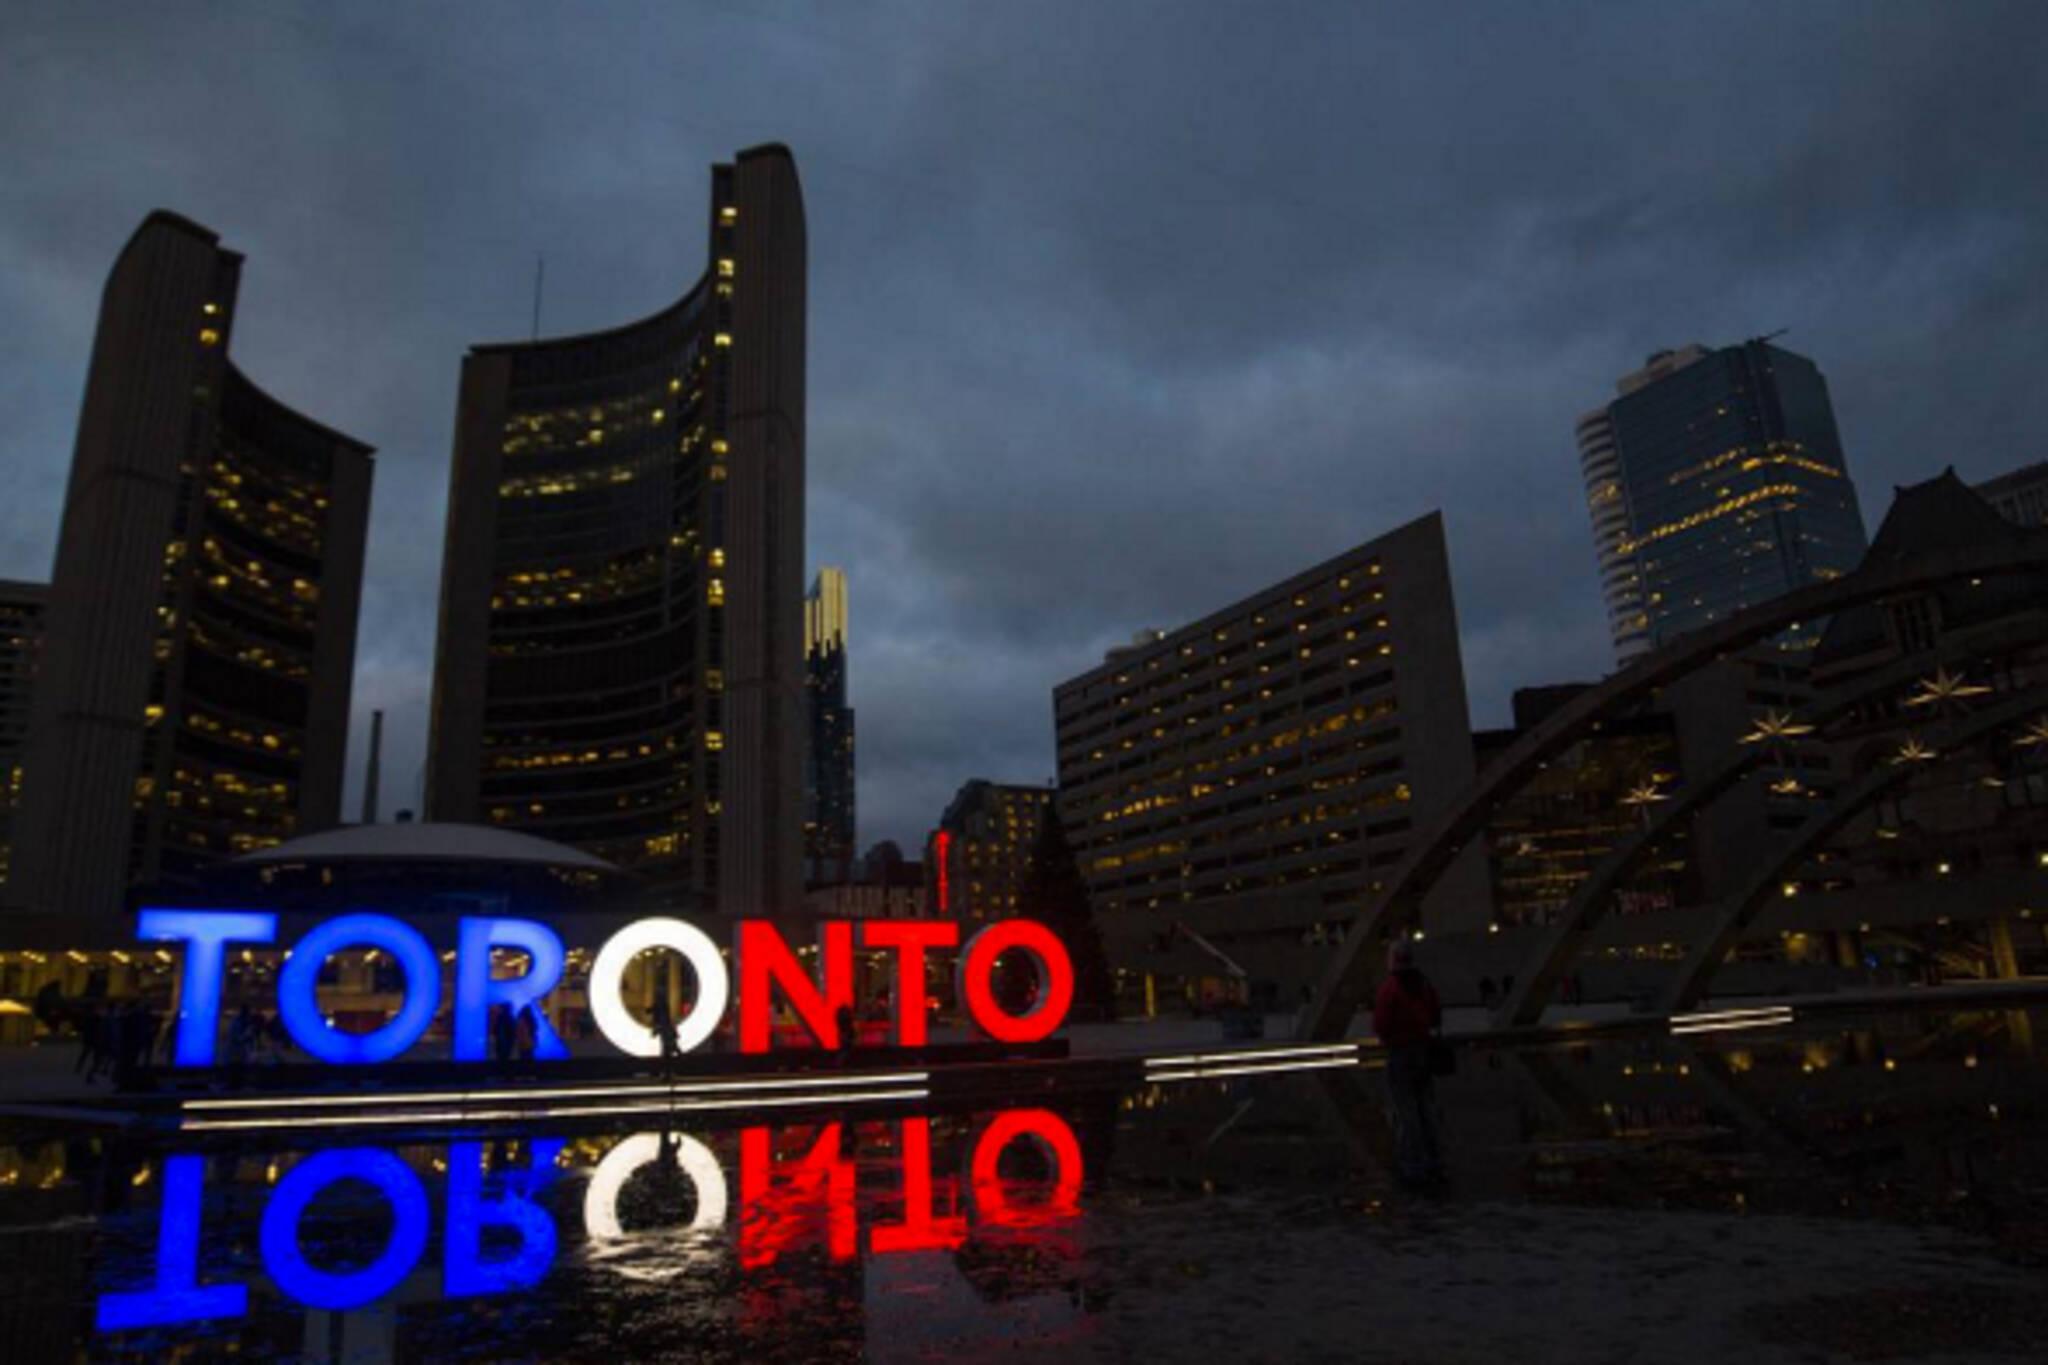 Toronto Nice France vigil